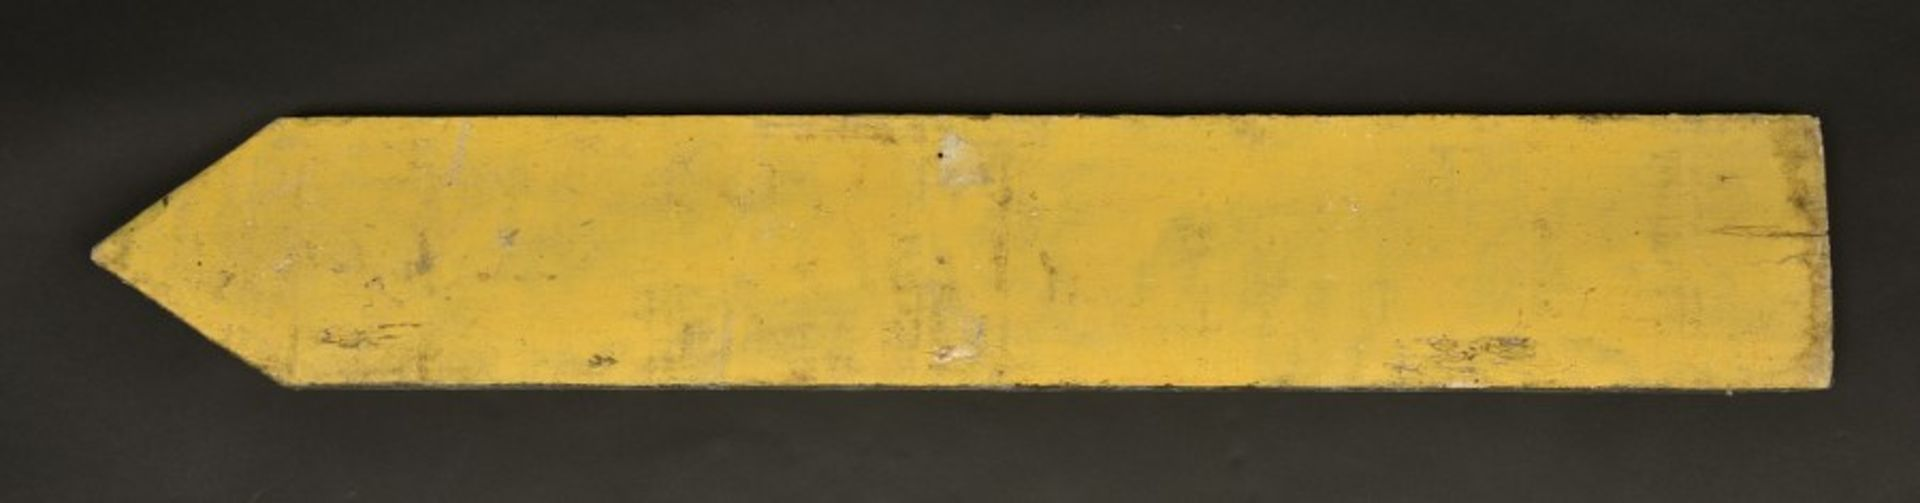 Panneau directionnel Caen über Bayeux. Directional sign Caen über Bayeux.En bois, fond peint en - Bild 2 aus 4